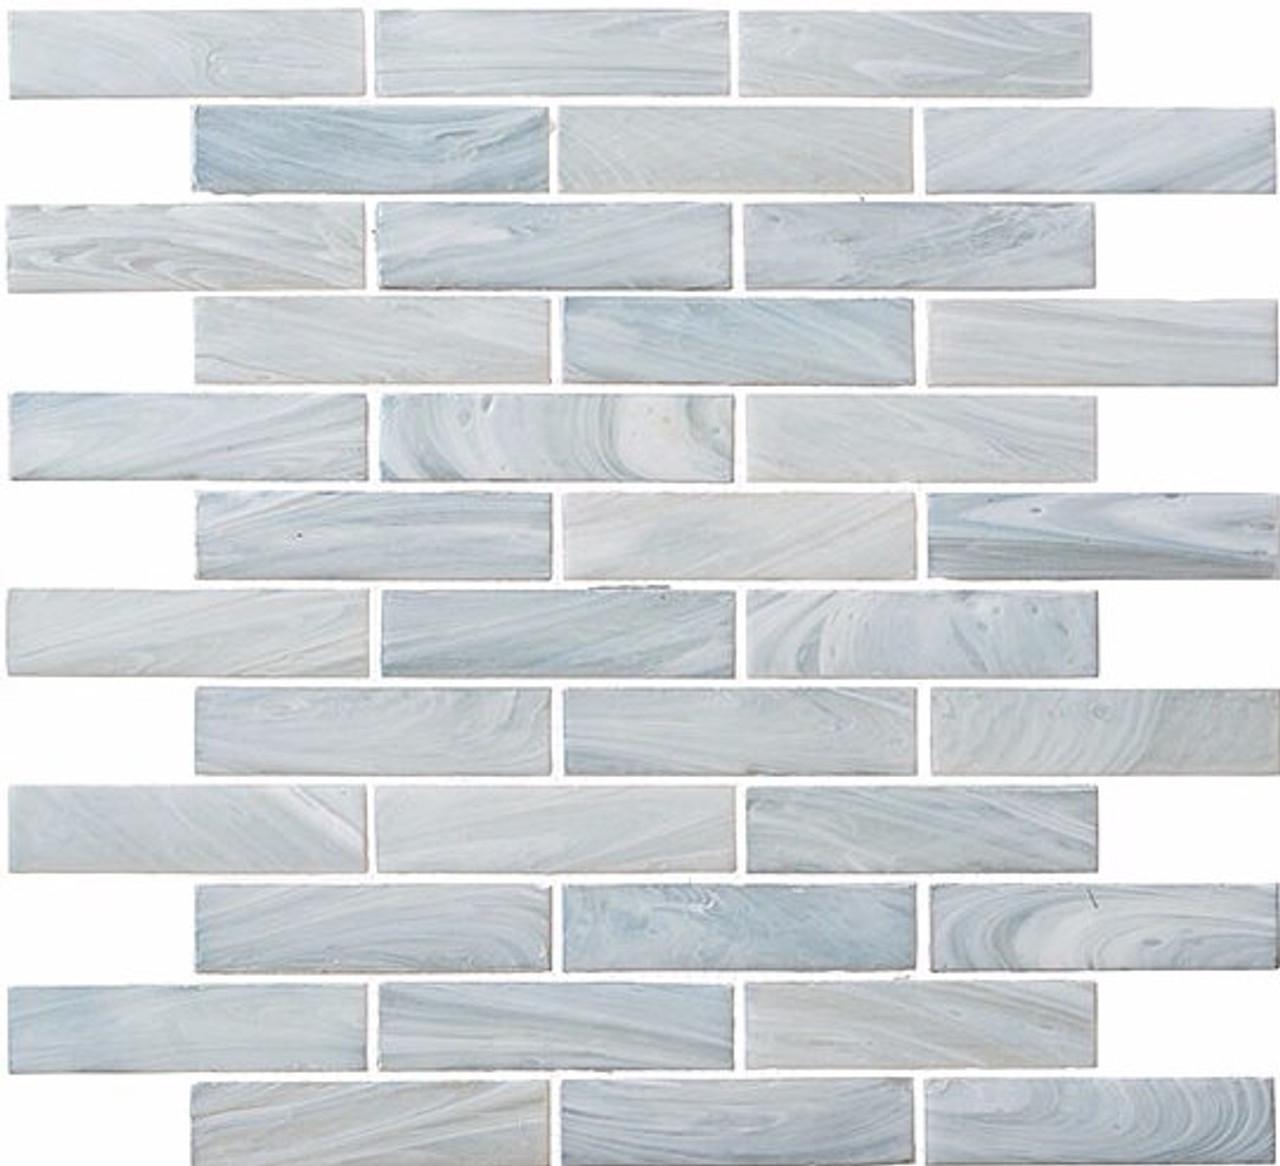 Bella Glass Tiles New England Series Vineyard Patio